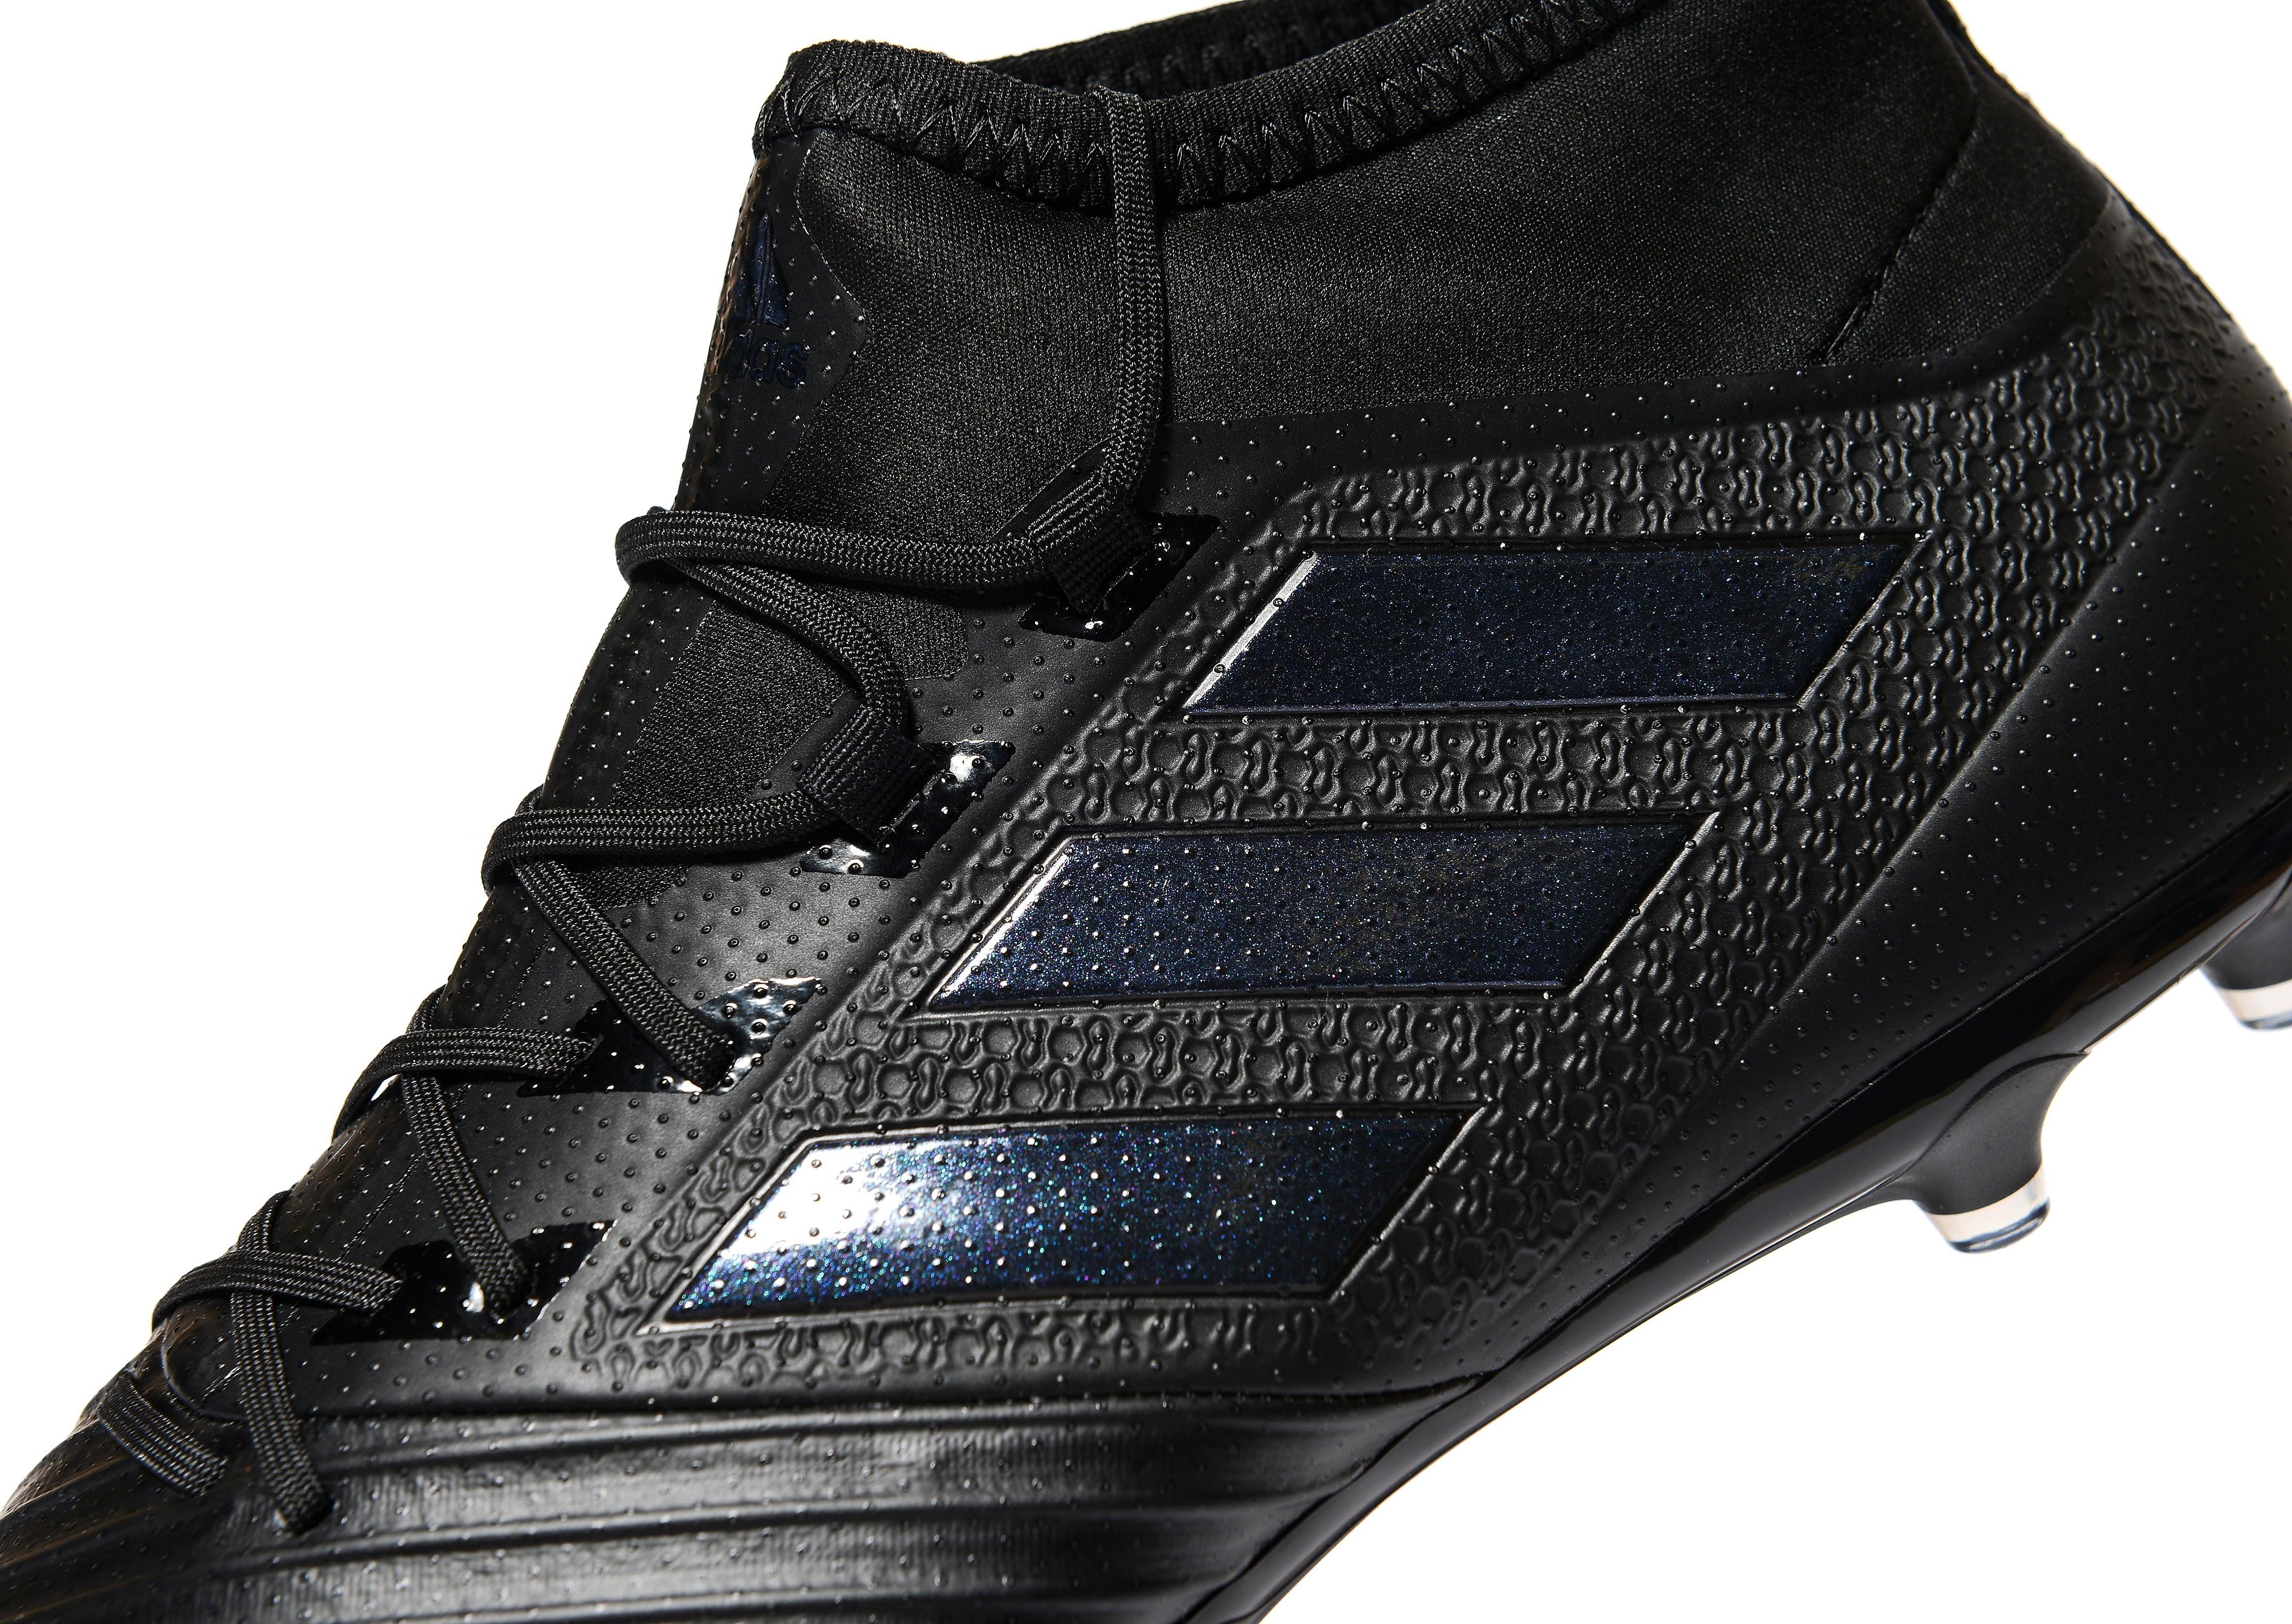 adidas Magnetic Storm ACE 17.2 Primeknit FG